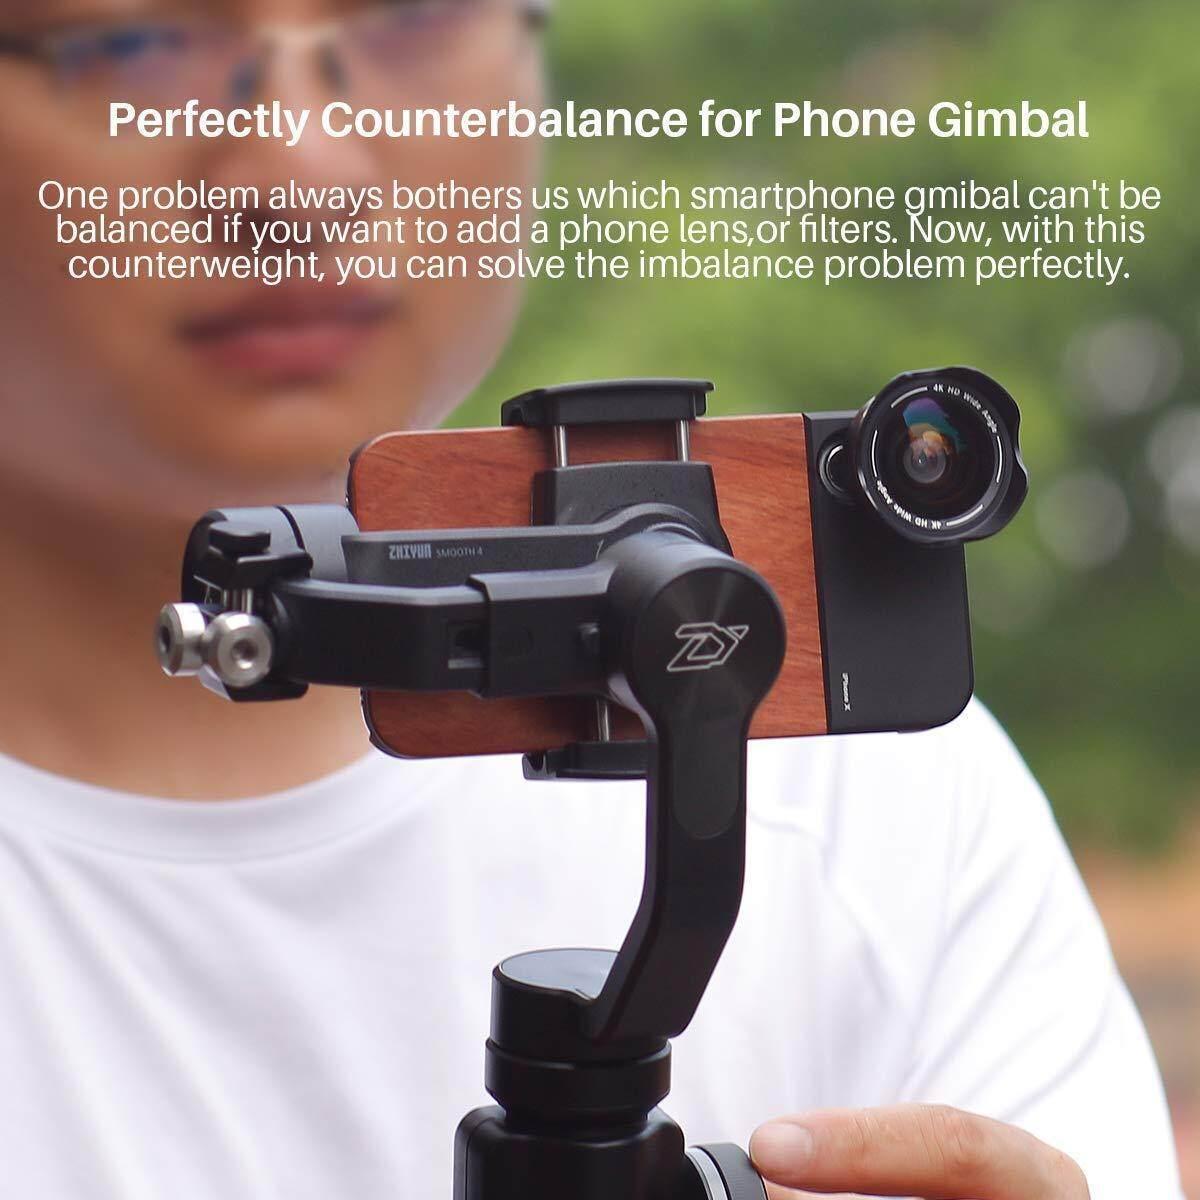 Counter Weight for DJI Osmo Mobile 2 Feiyu Vimble Zhiyun Smooth 4 Handheld Gimbal Phone Stabilizer Counterweight Moment Balance